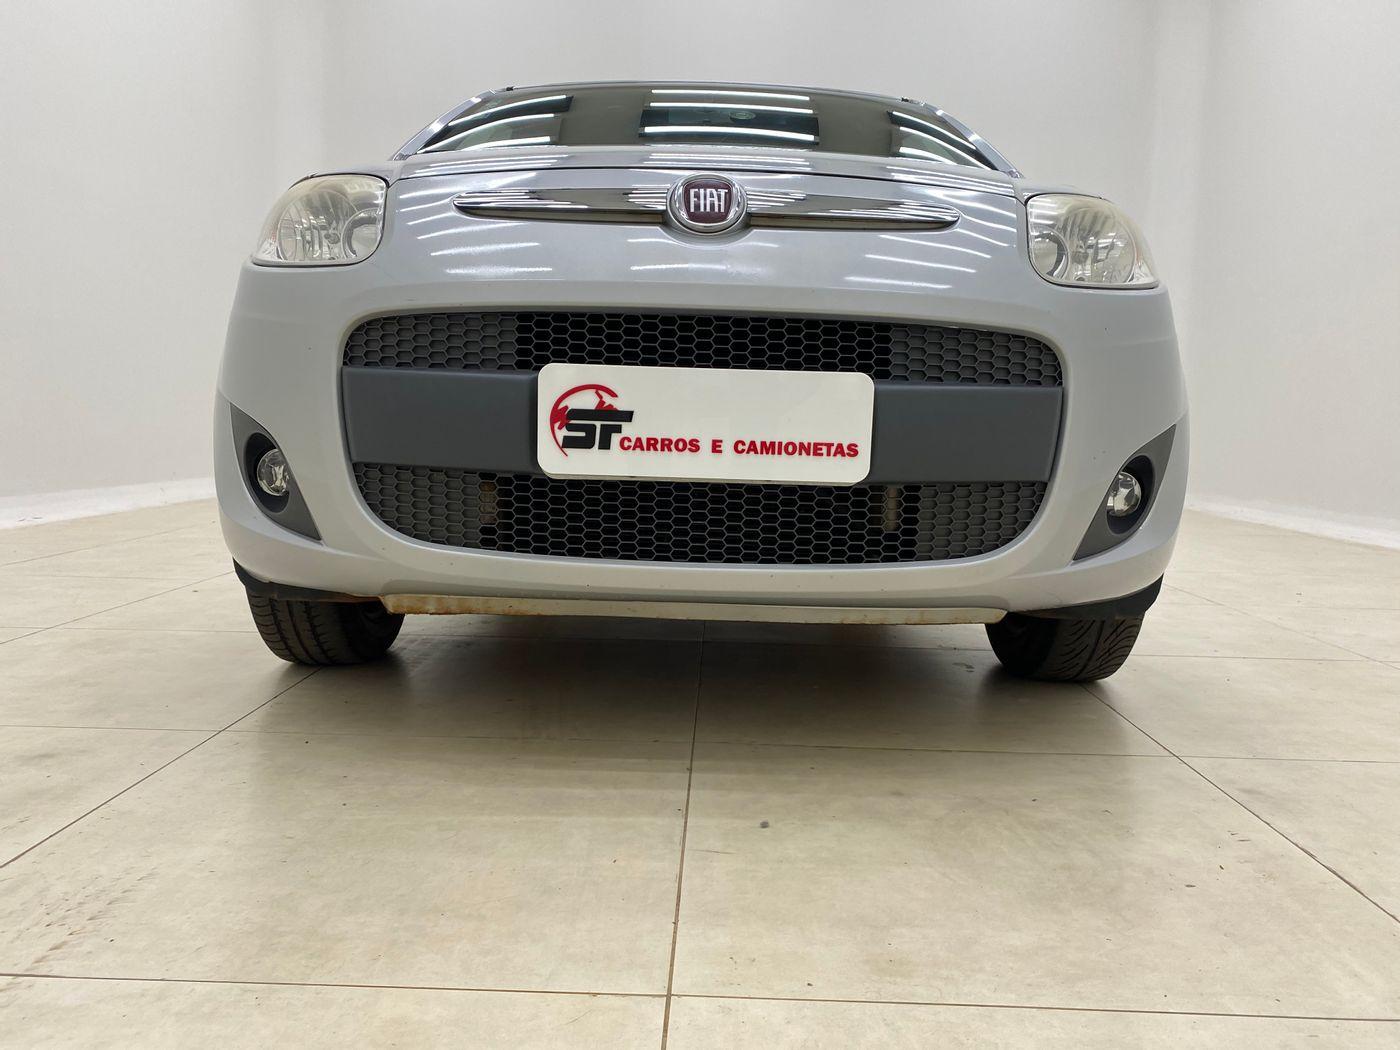 Fiat Palio ATTRA./ITÁLIA 1.4 EVO F.Flex 8V 5p